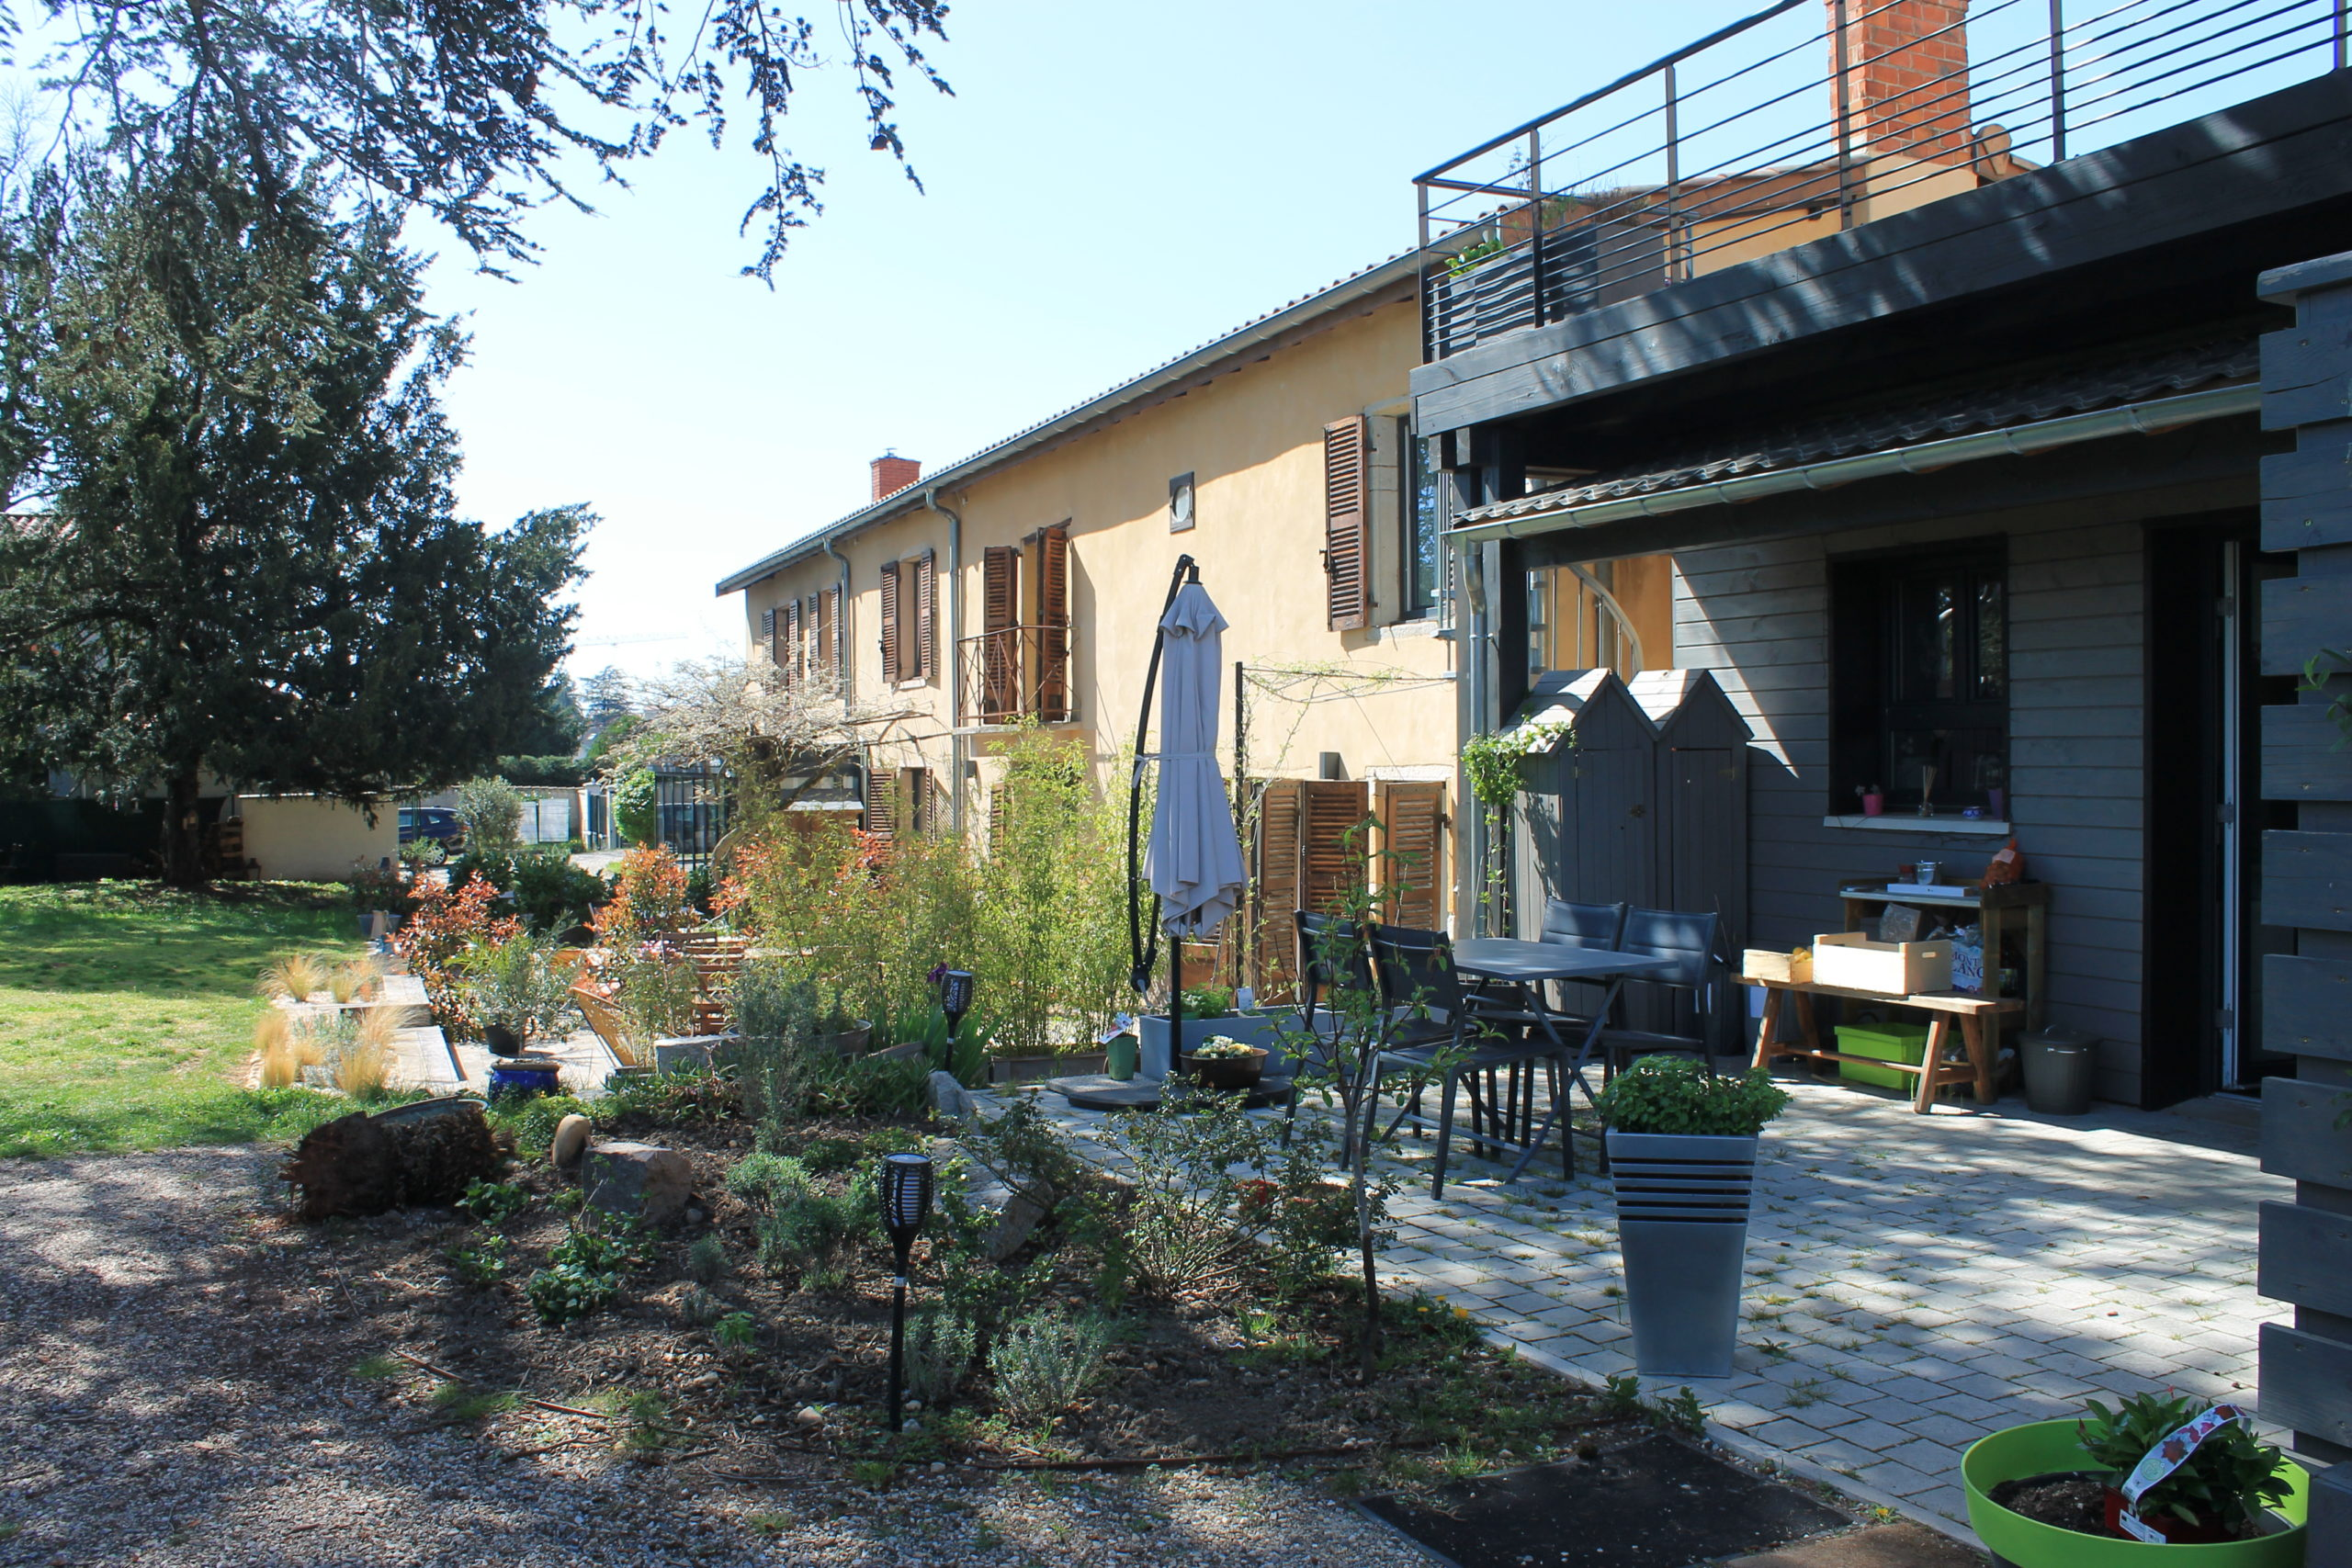 Cologi Irigny - un parc arboré